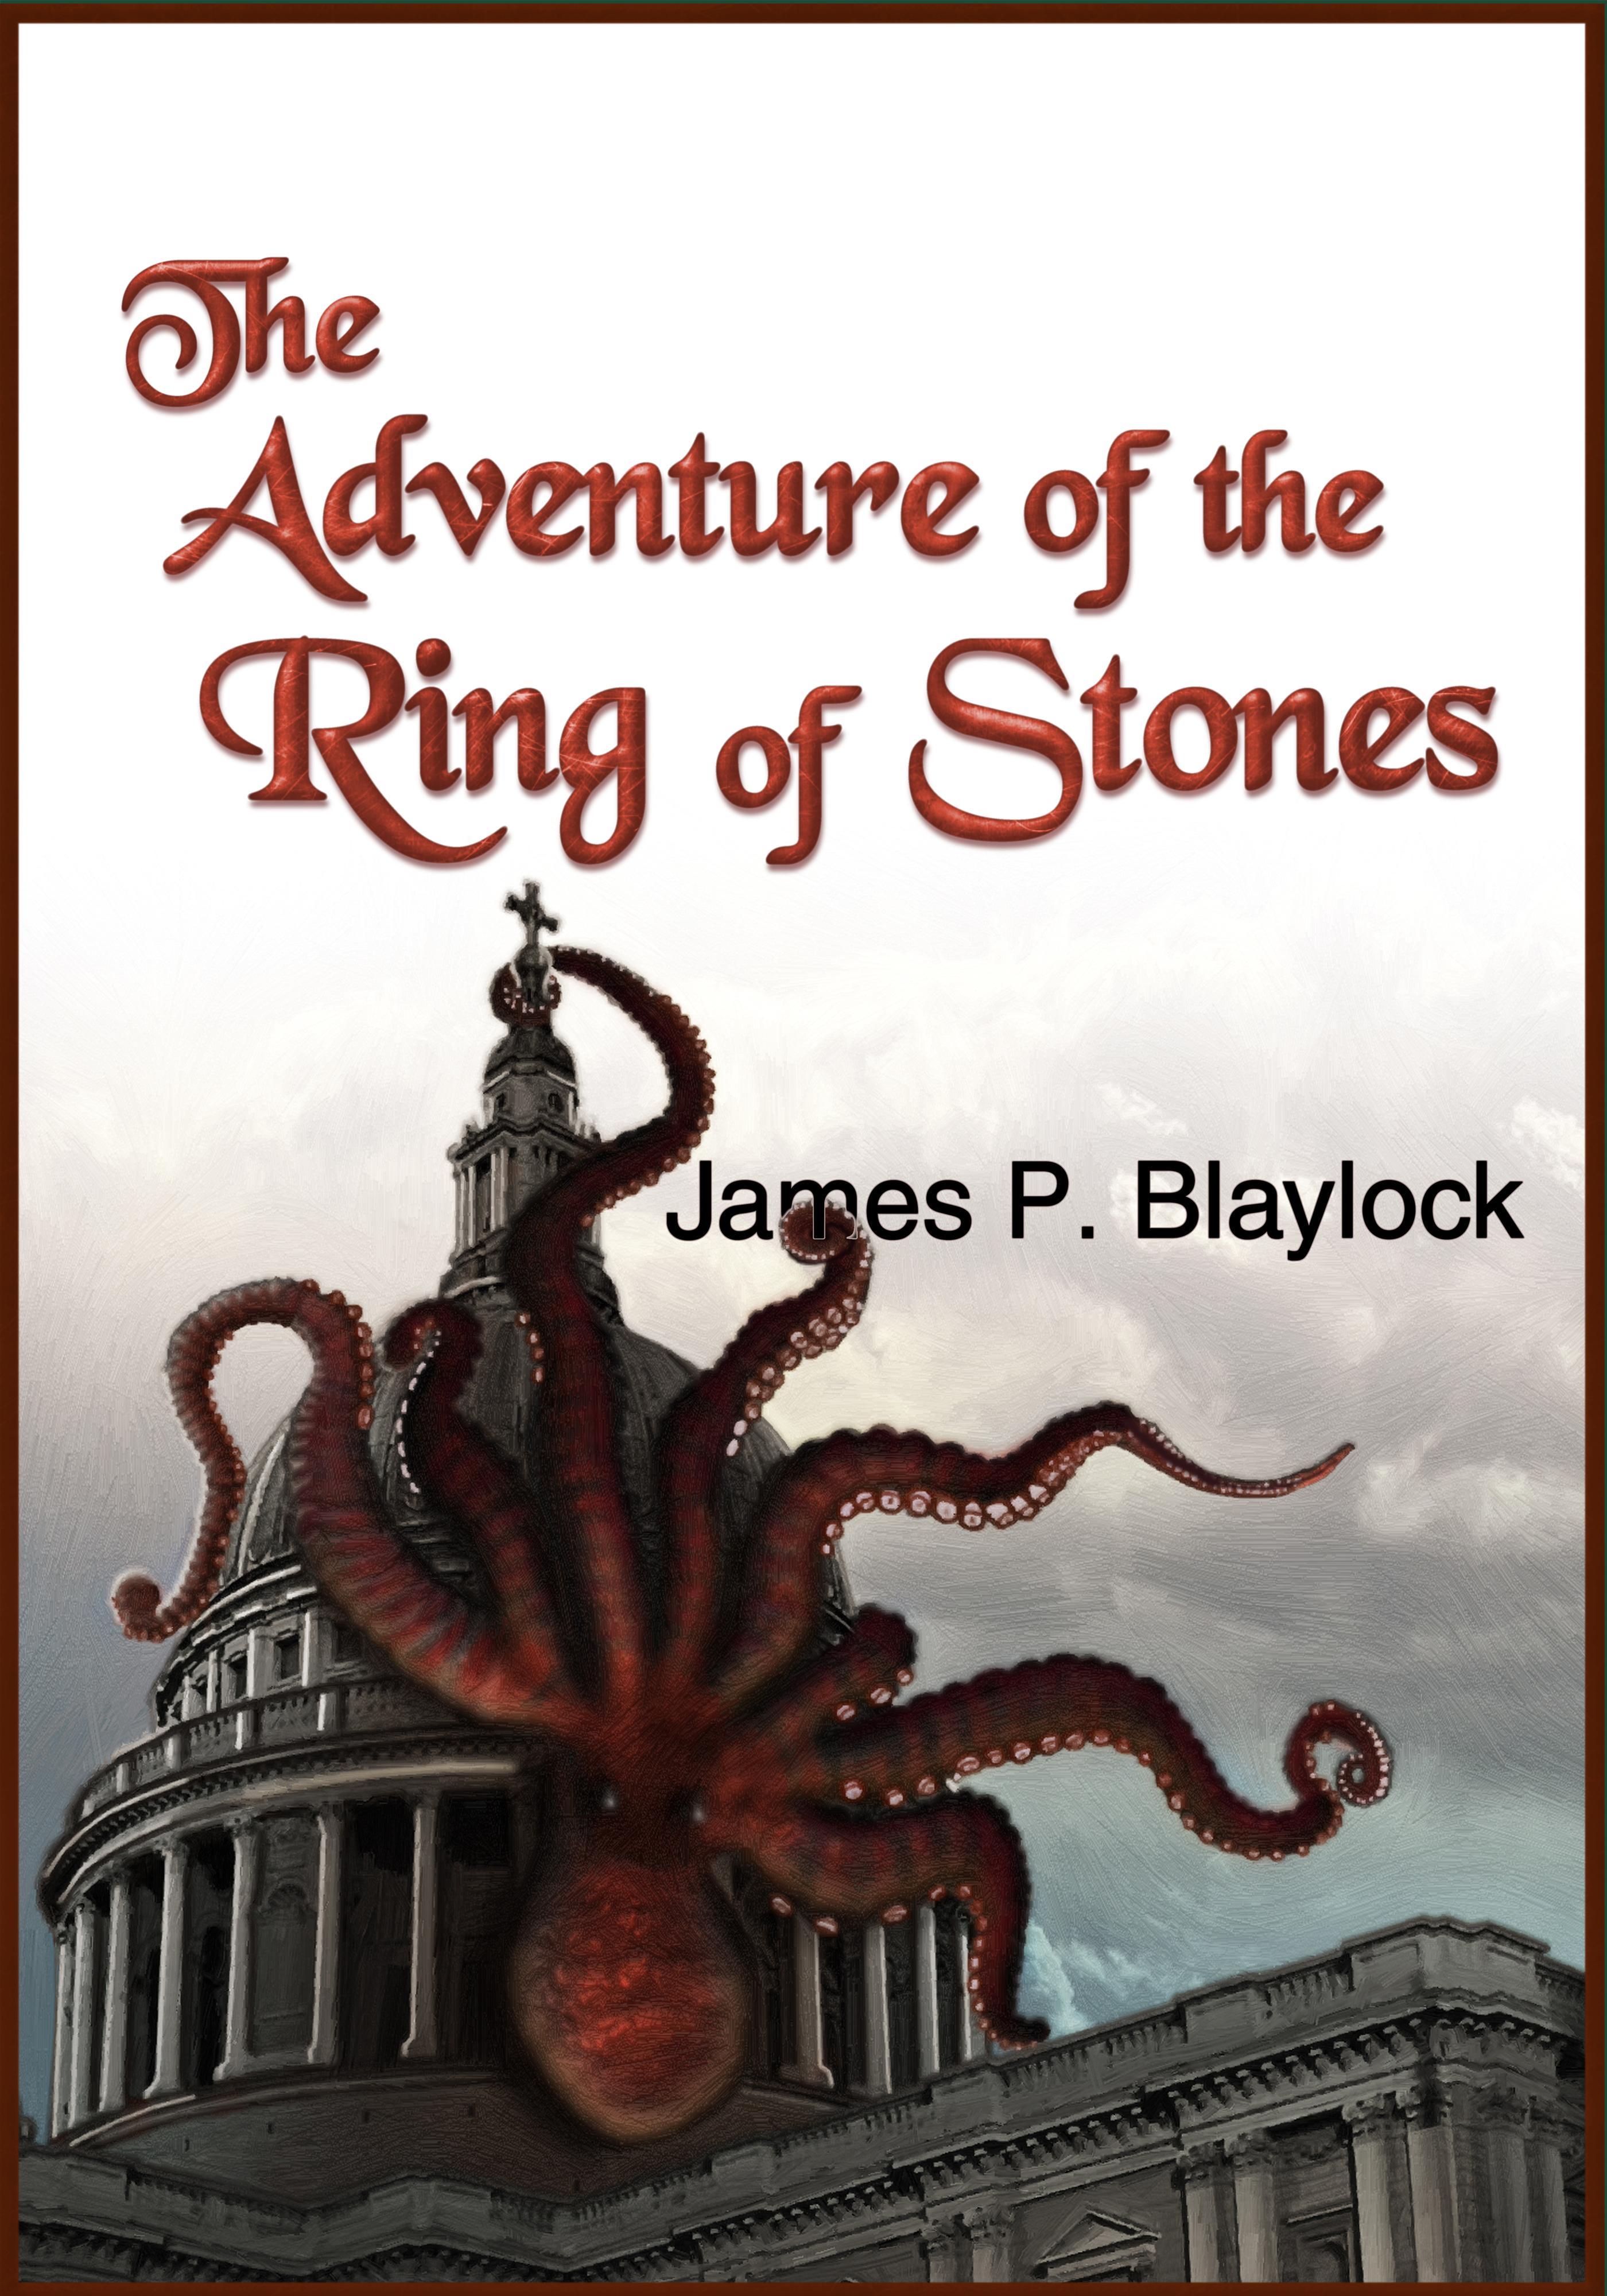 Blaylock_RingofStones